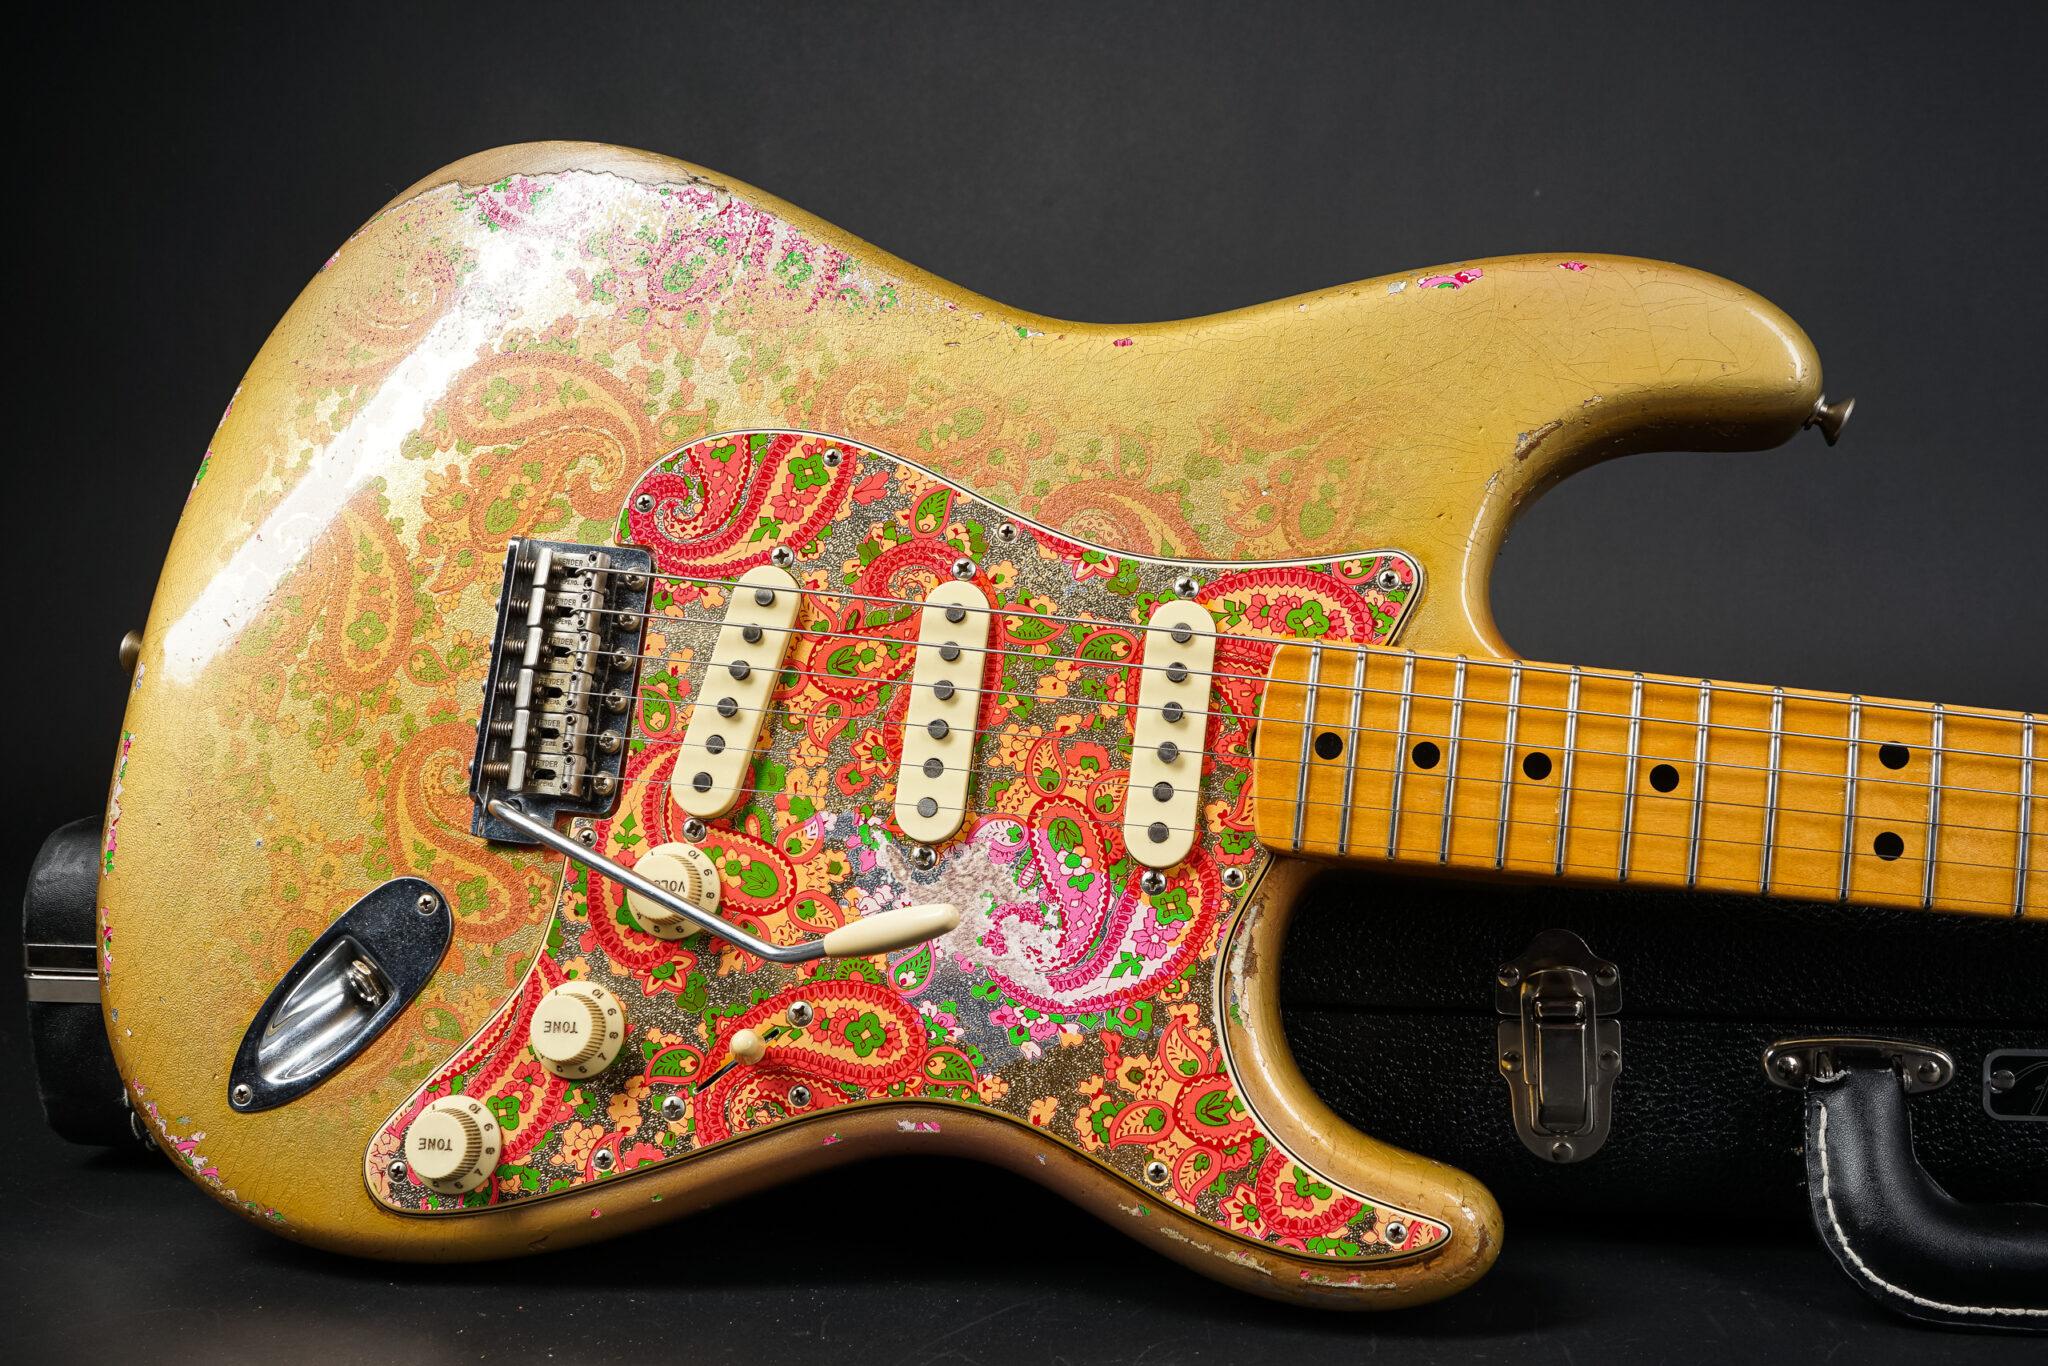 https://guitarpoint.de/app/uploads/products/2017-fender-dale-wilson-masterbuilt-1969-gold-paisely-stratocaster/2017-Fender-MBDW-Paisley-Gold69-Strat-CZ533204-9-2048x1366.jpg